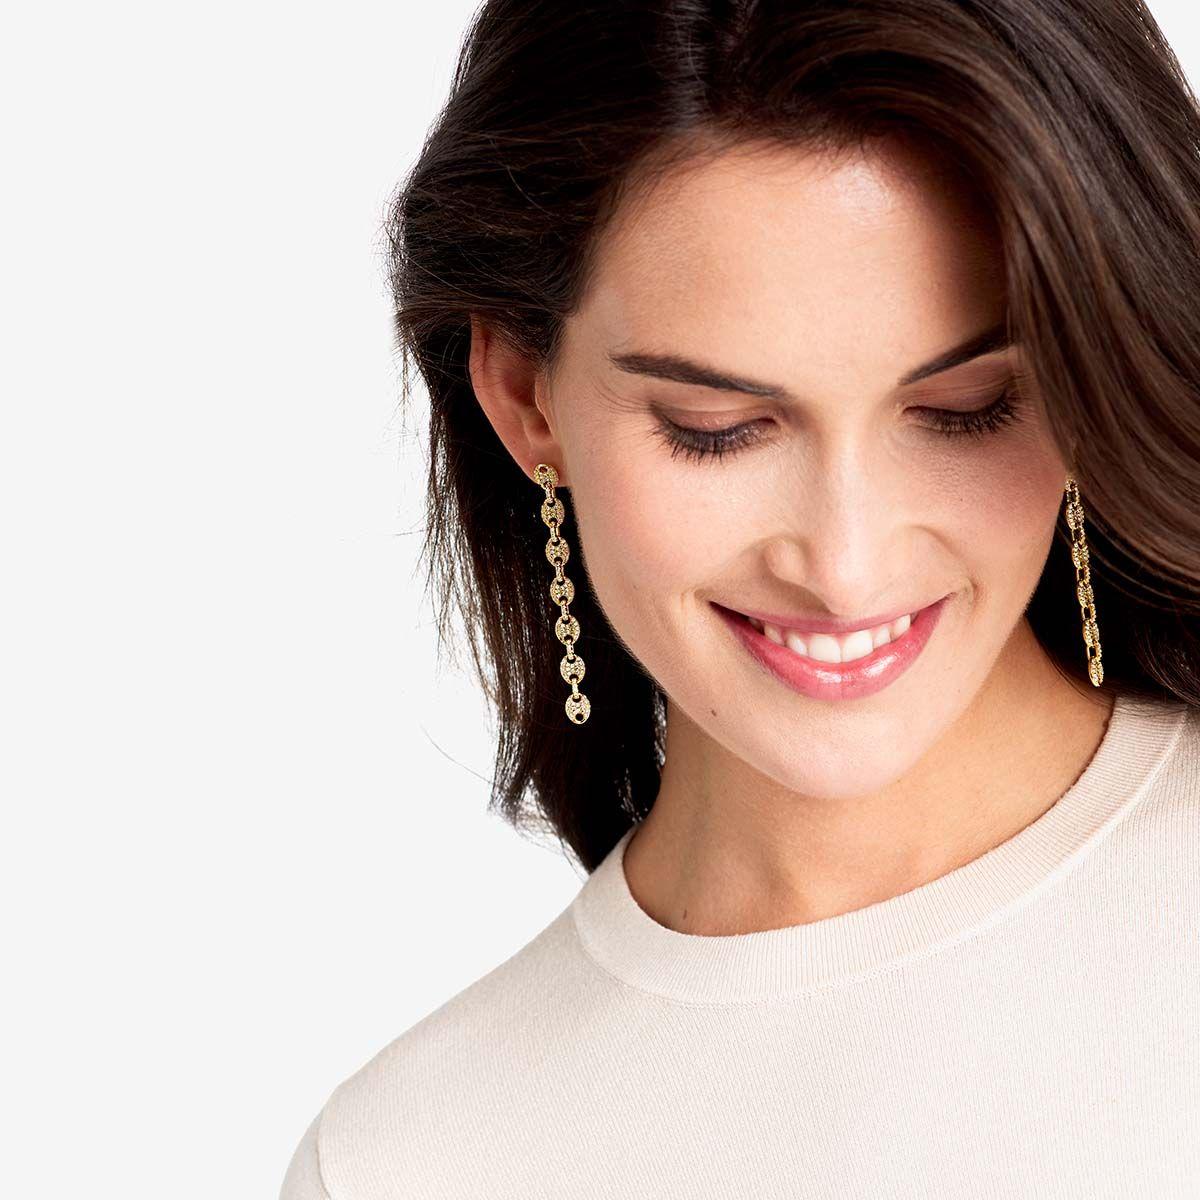 The Pave Mariner Link Drop Earrings - Ohrhänger - 18k vergoldet